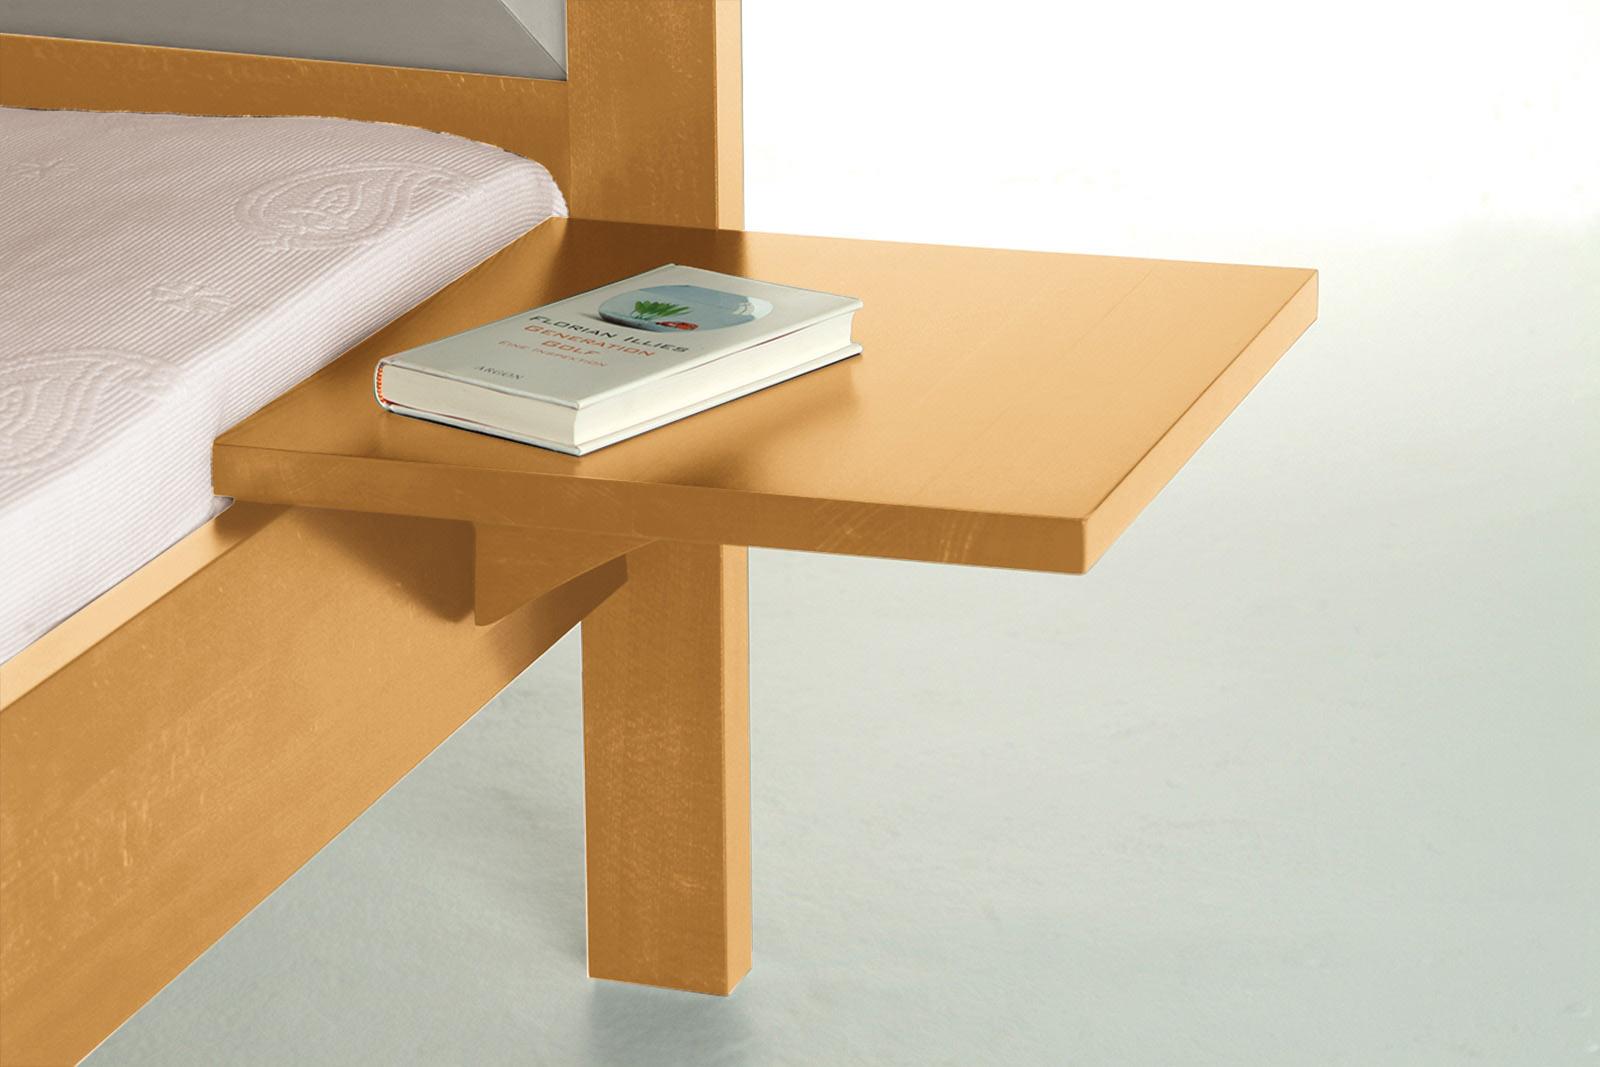 nachttisch zum einh ngen am bett massivholz 40 x 40 cm. Black Bedroom Furniture Sets. Home Design Ideas